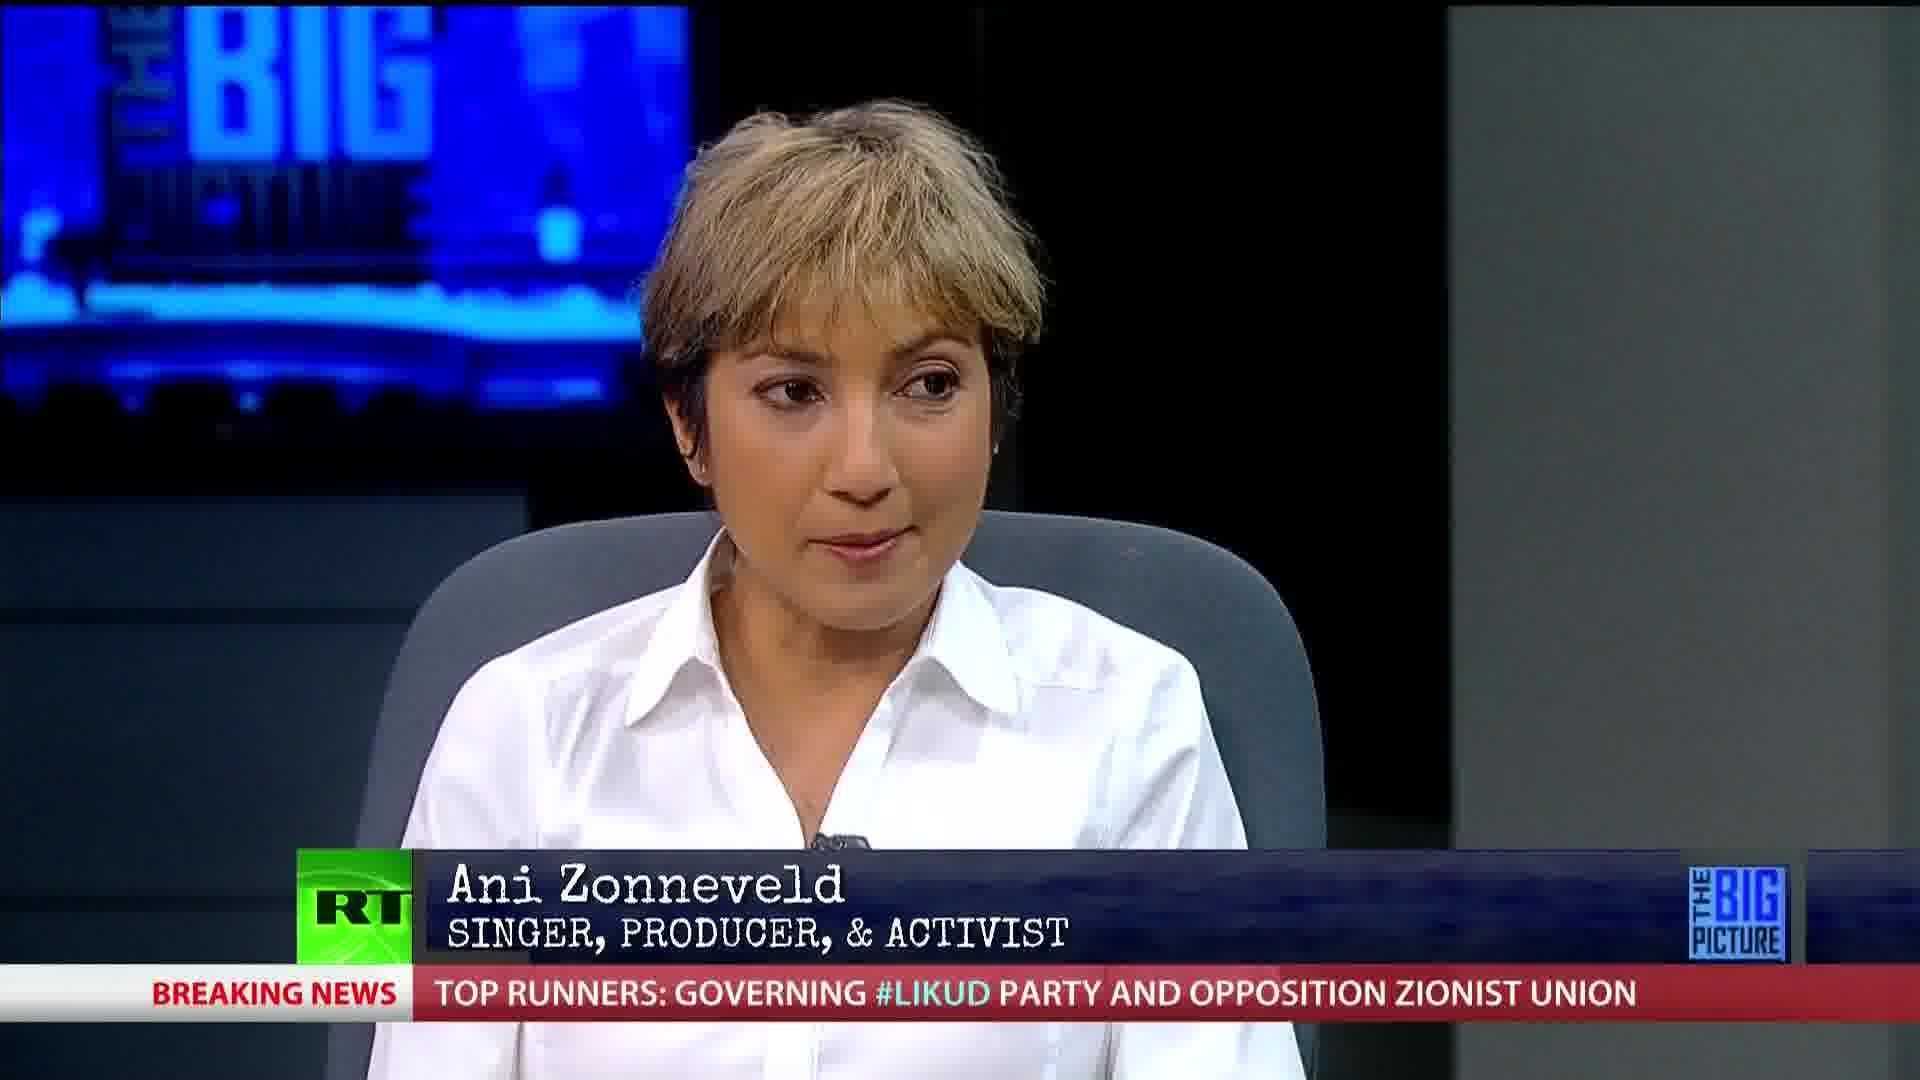 Ani Zonneveld, chi è l'imam donna che celebra i matrimoni omosessuali e interreligiosi